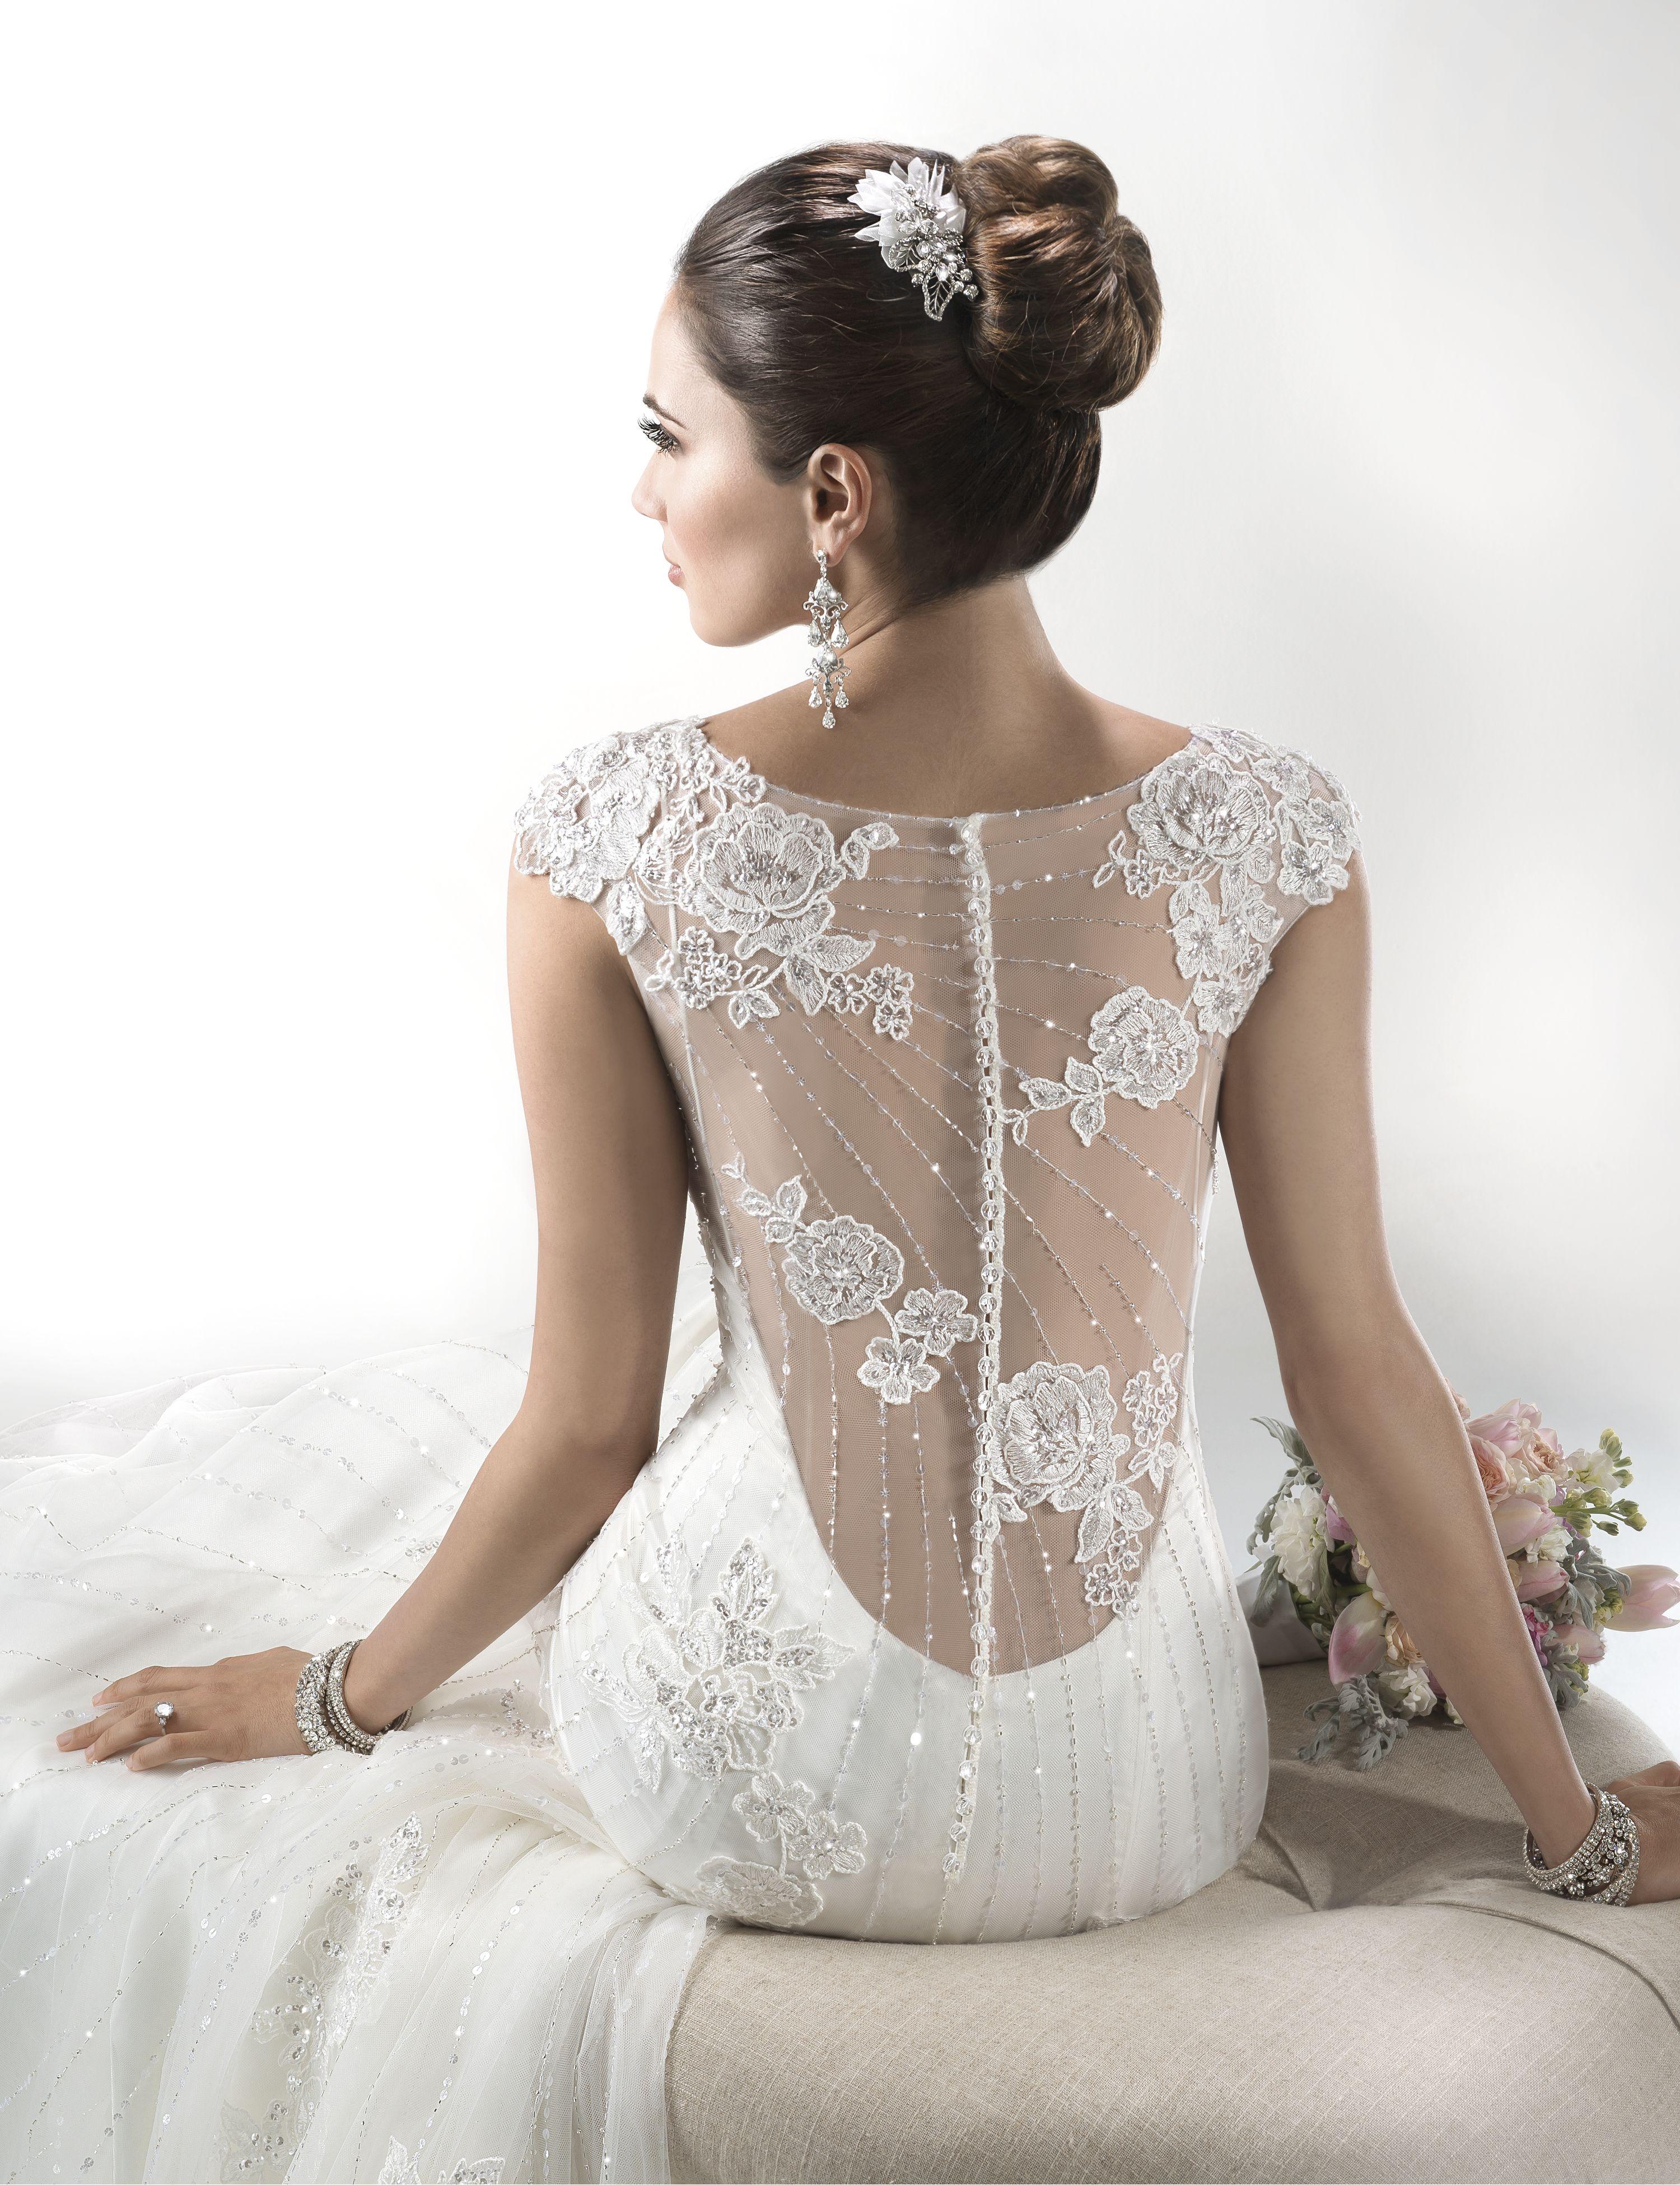 36++ Savannah wedding dress prices ideas